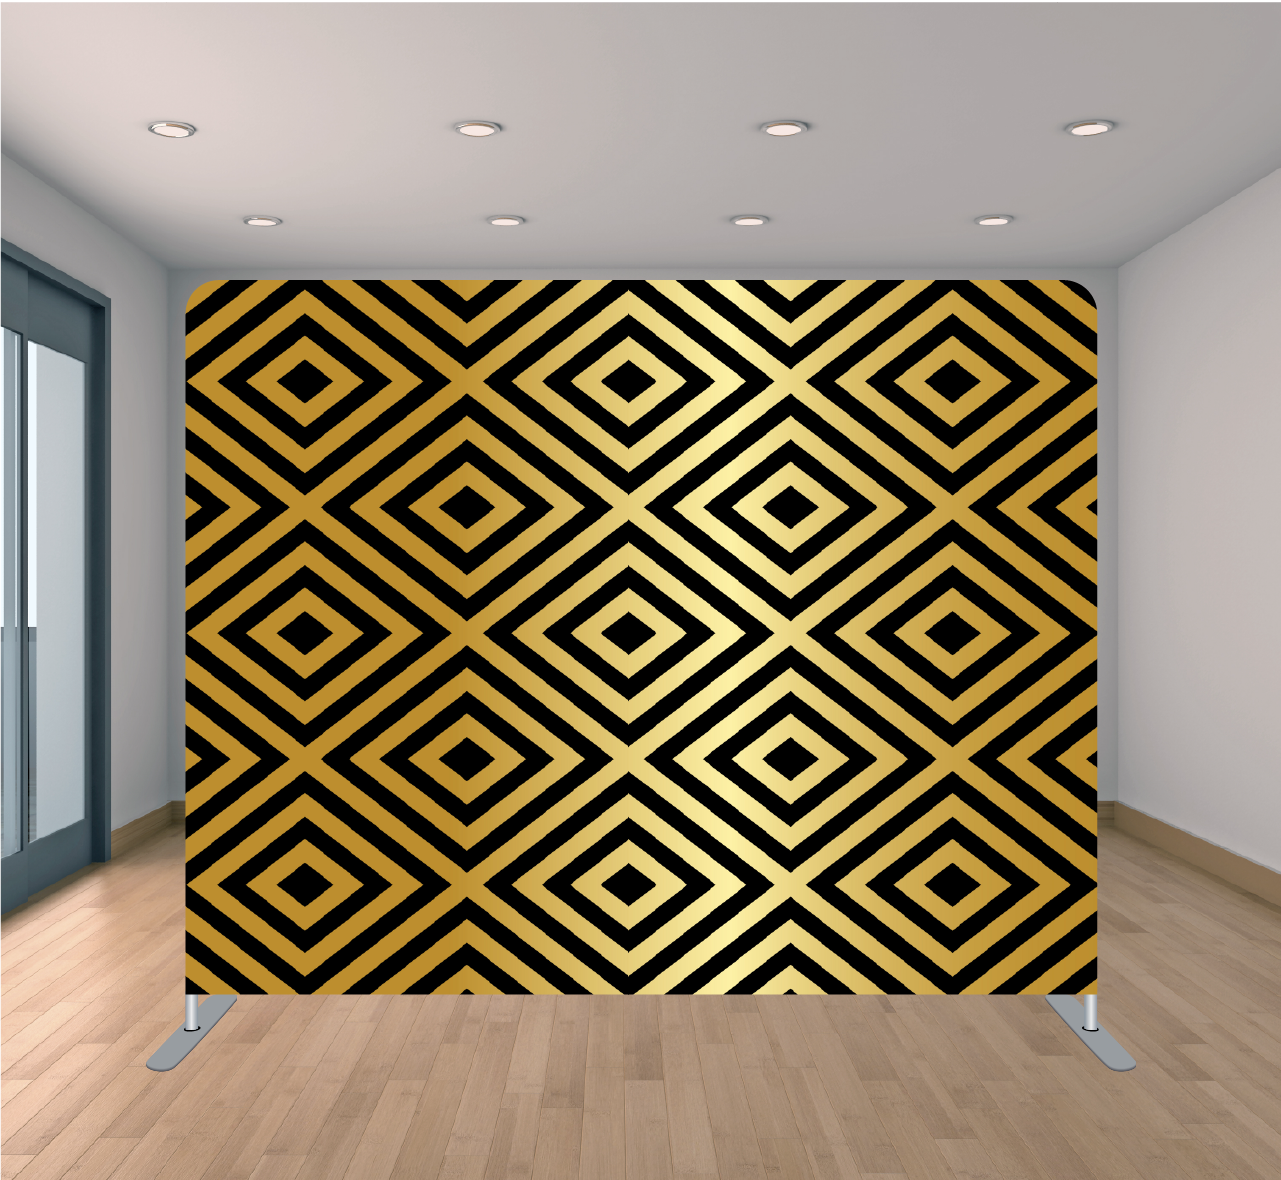 Gold_Squares-01